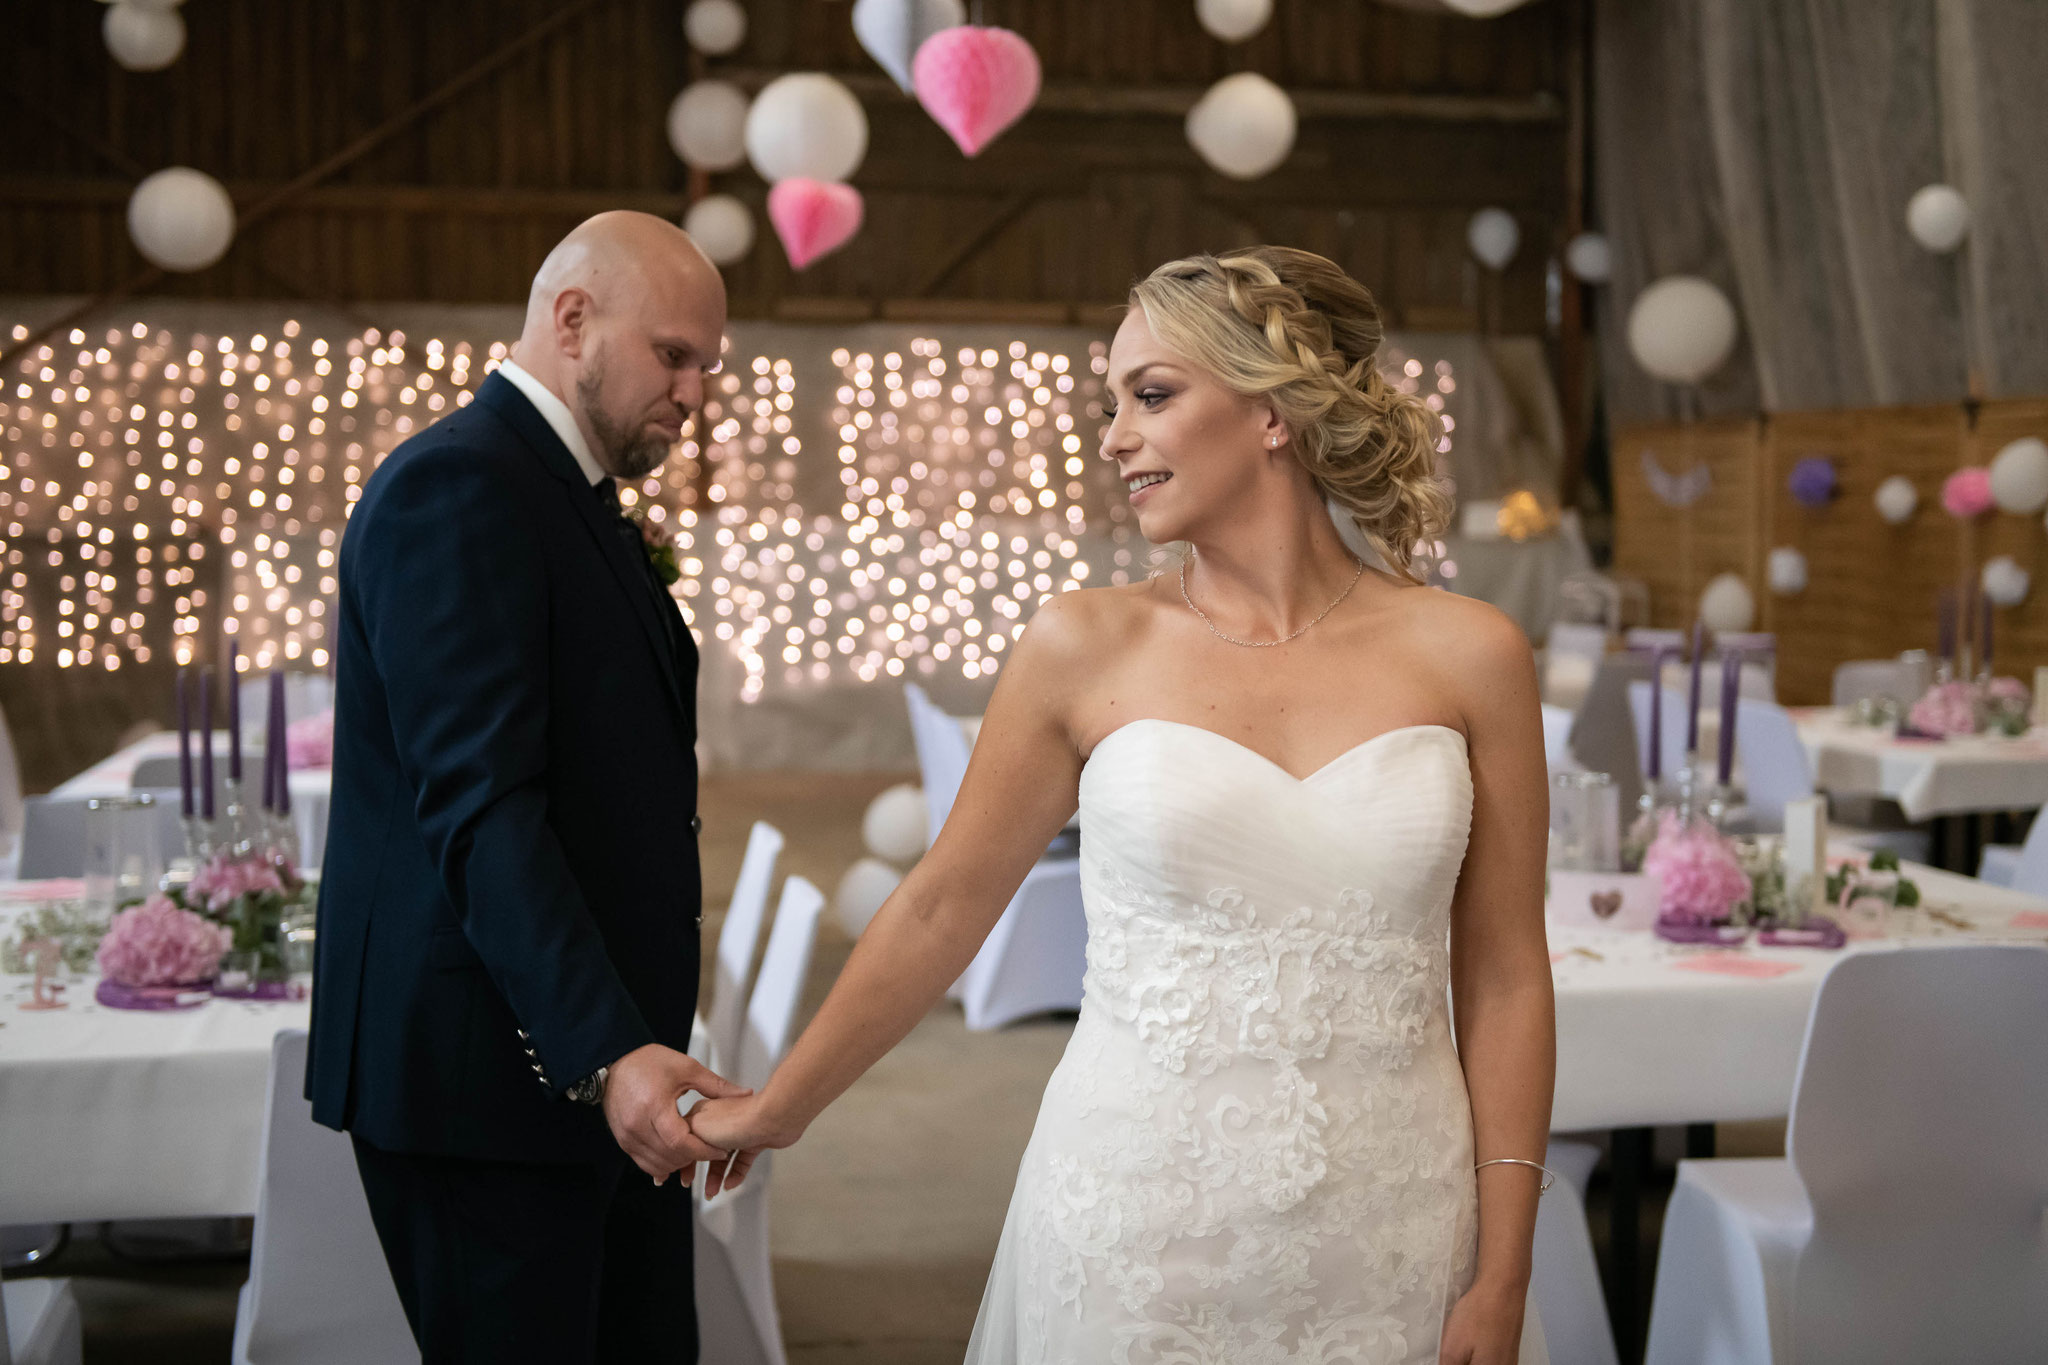 Bräutigam bewundert seine zukünftige Frau